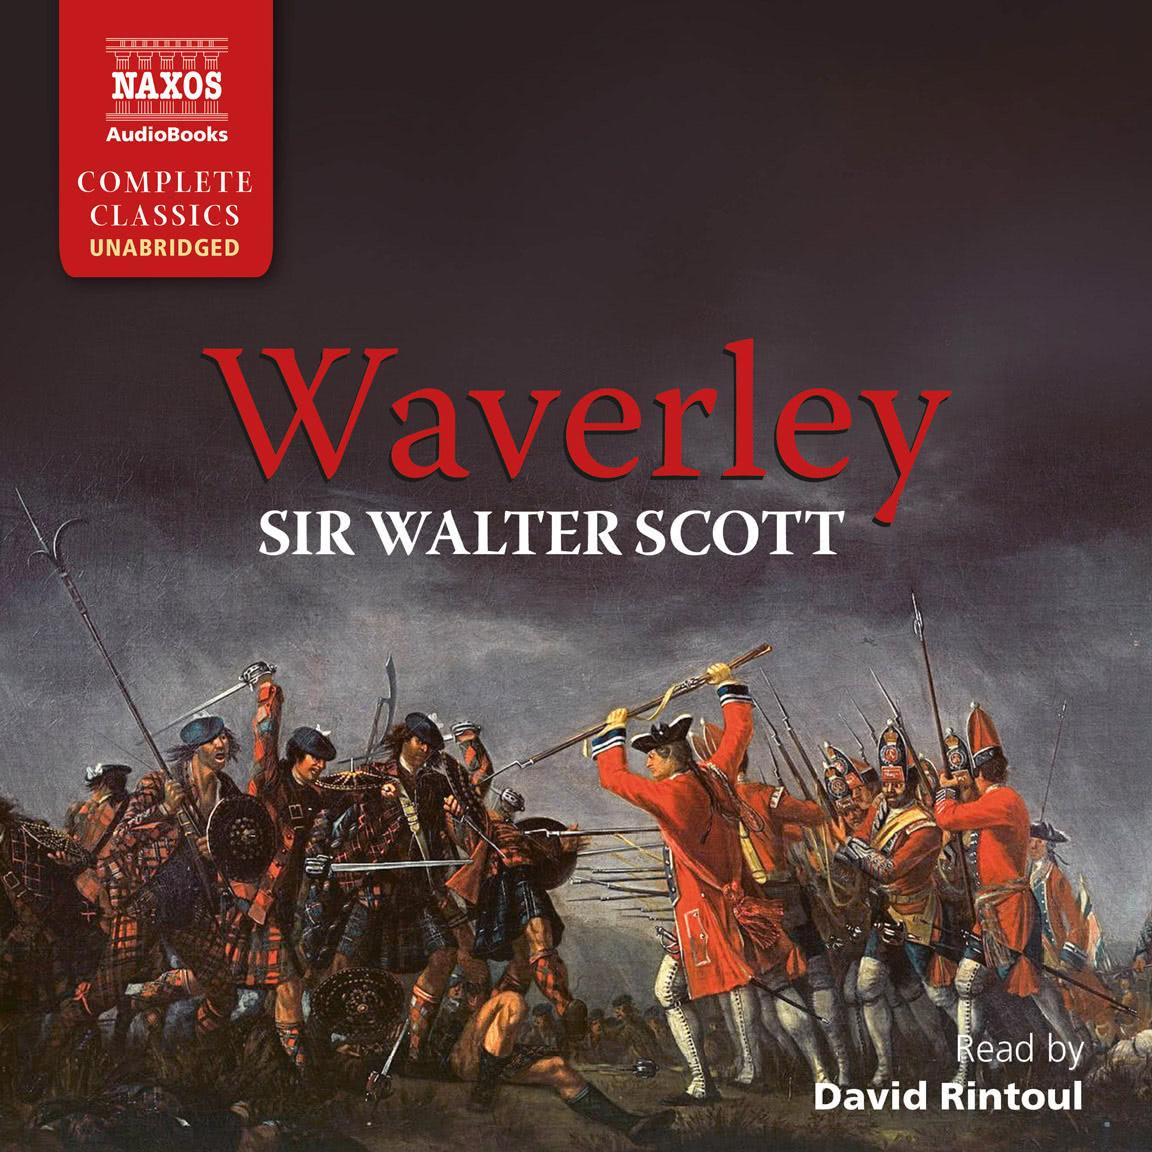 Waverley (unabridged)